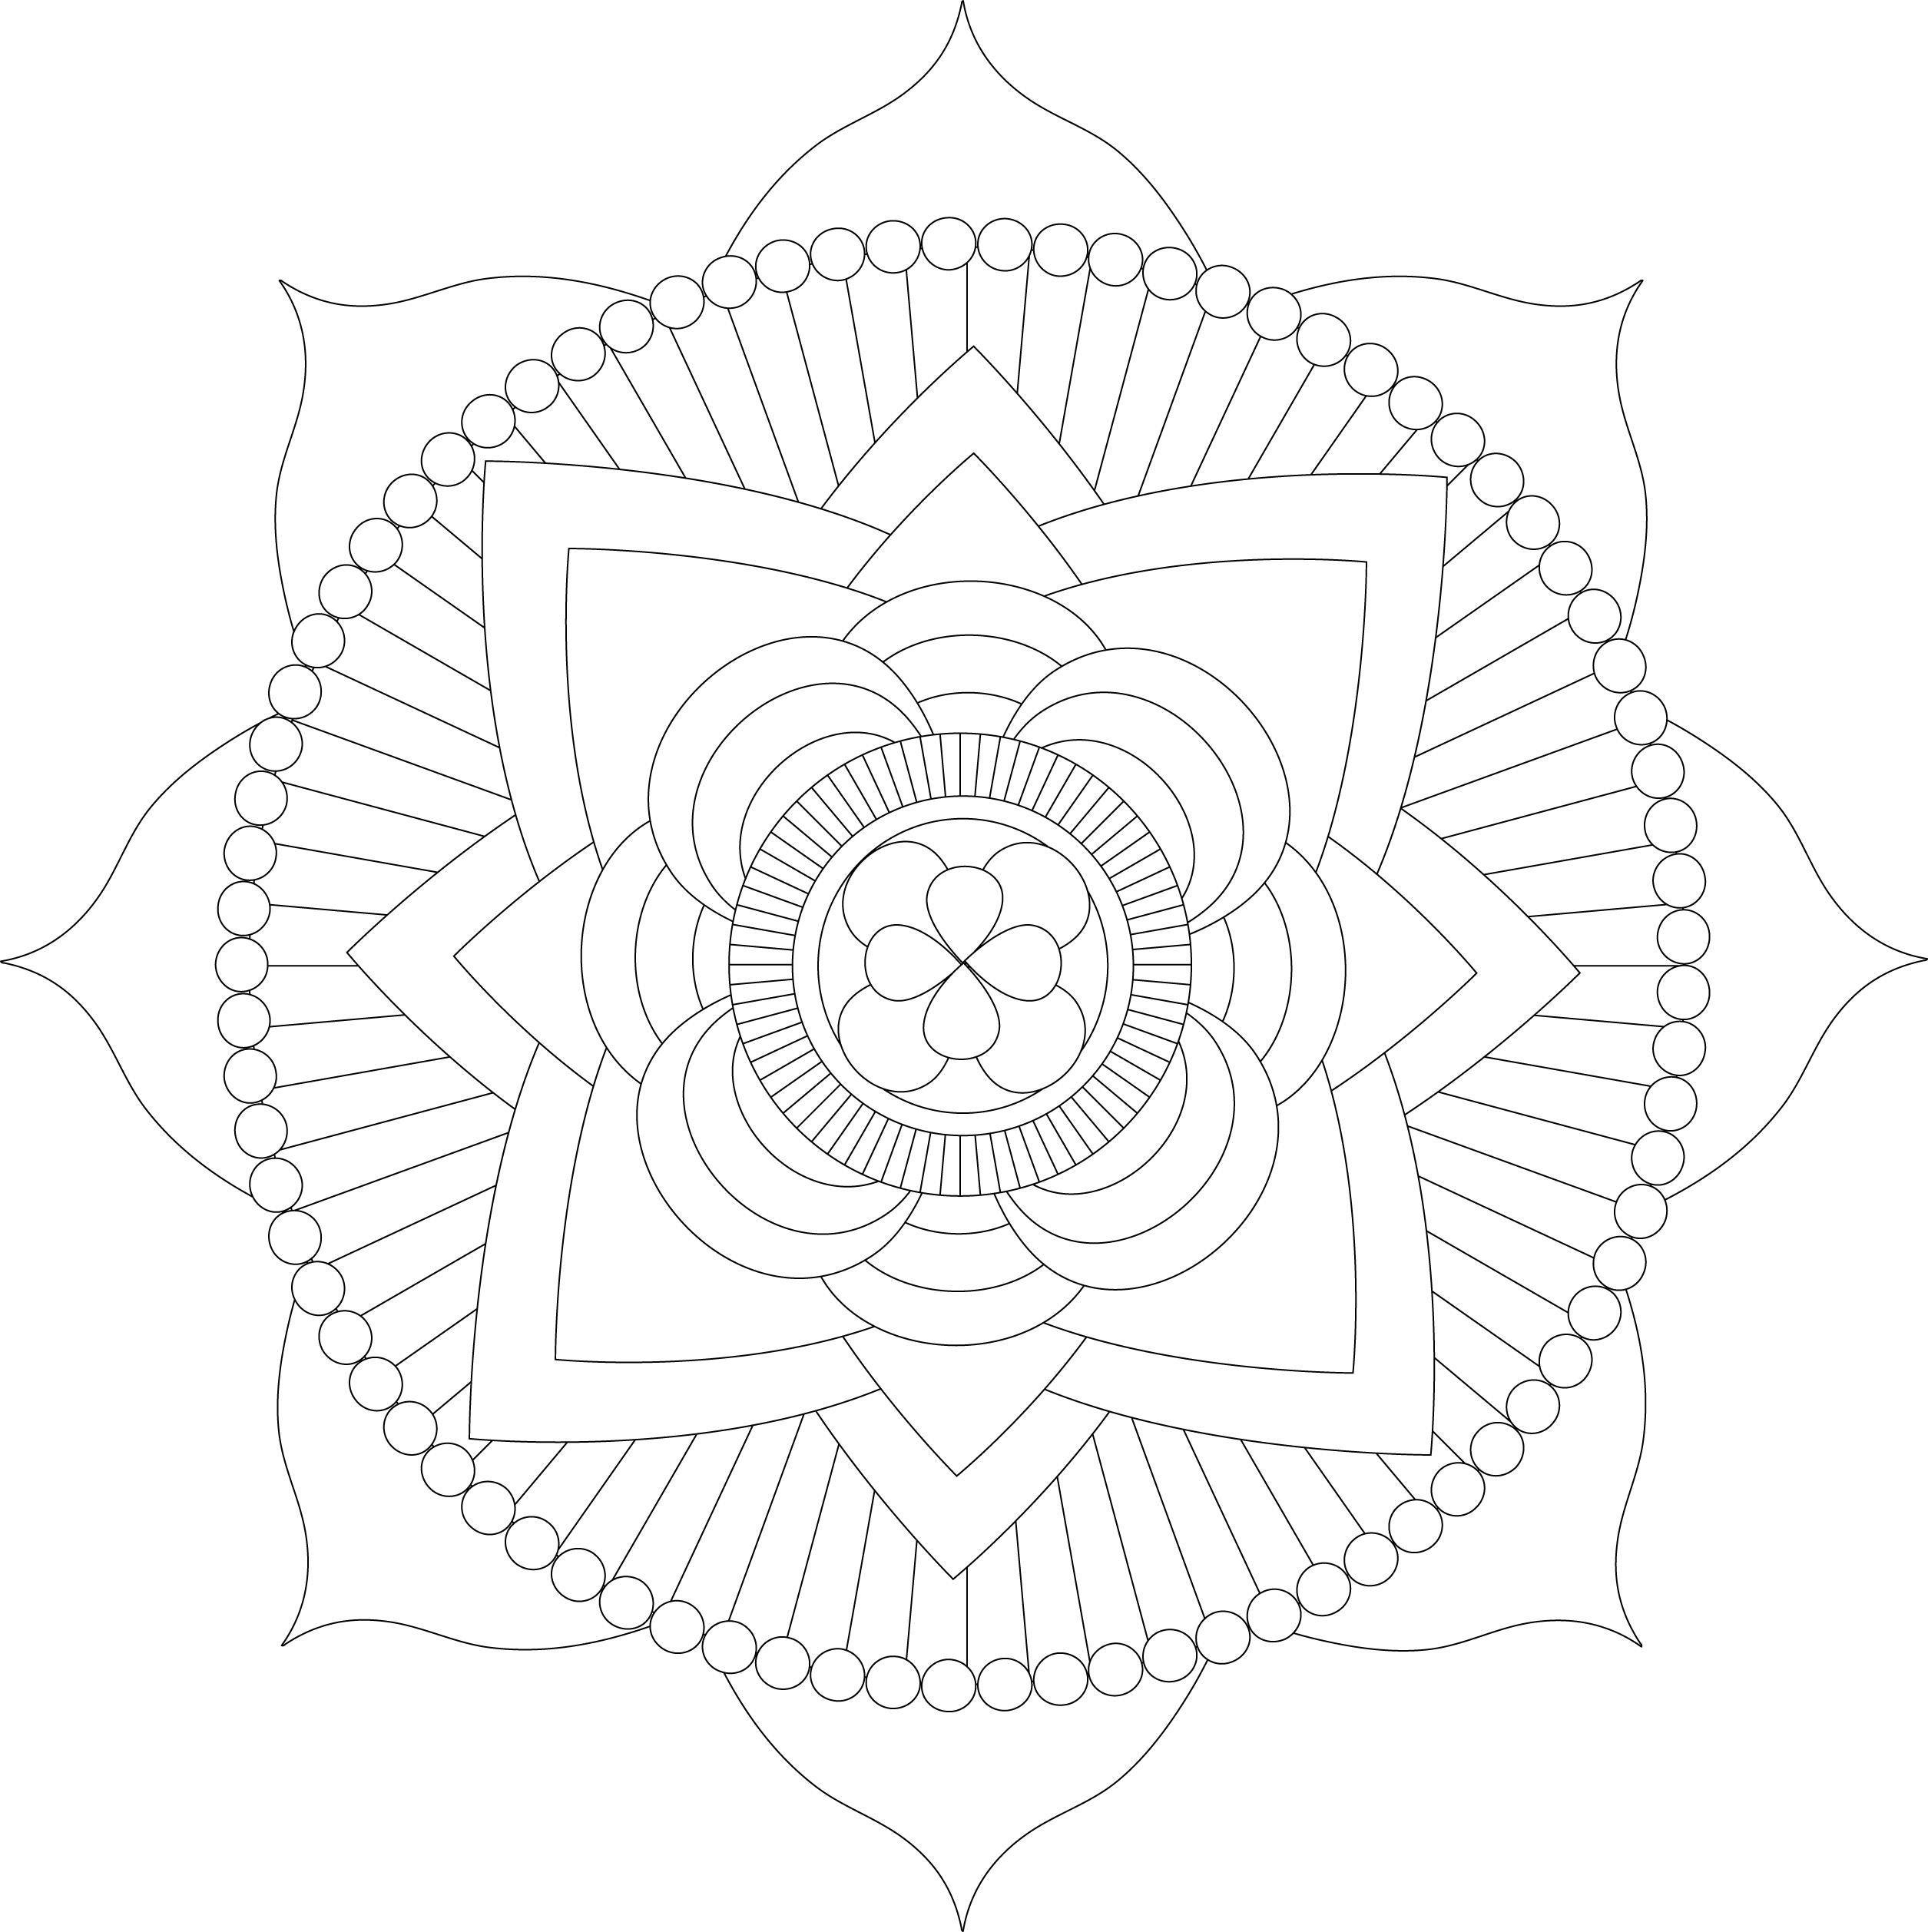 free mandalas for kids simple mandala with some geometric patterns hand drawn for kids mandalas free